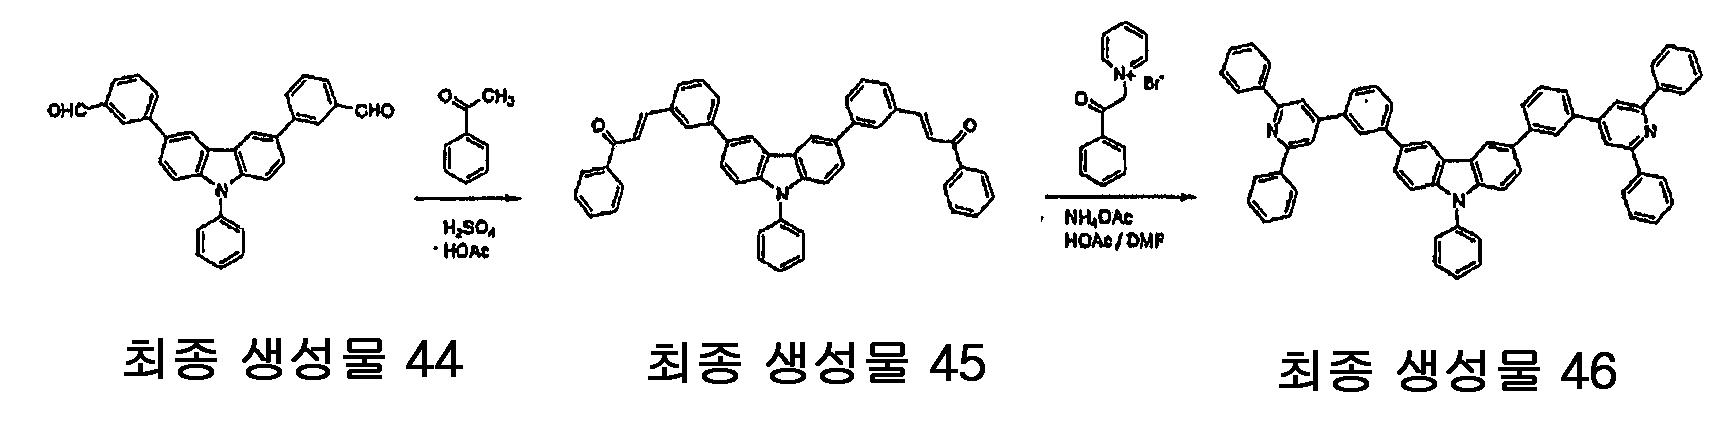 Figure 112010002231902-pat00134